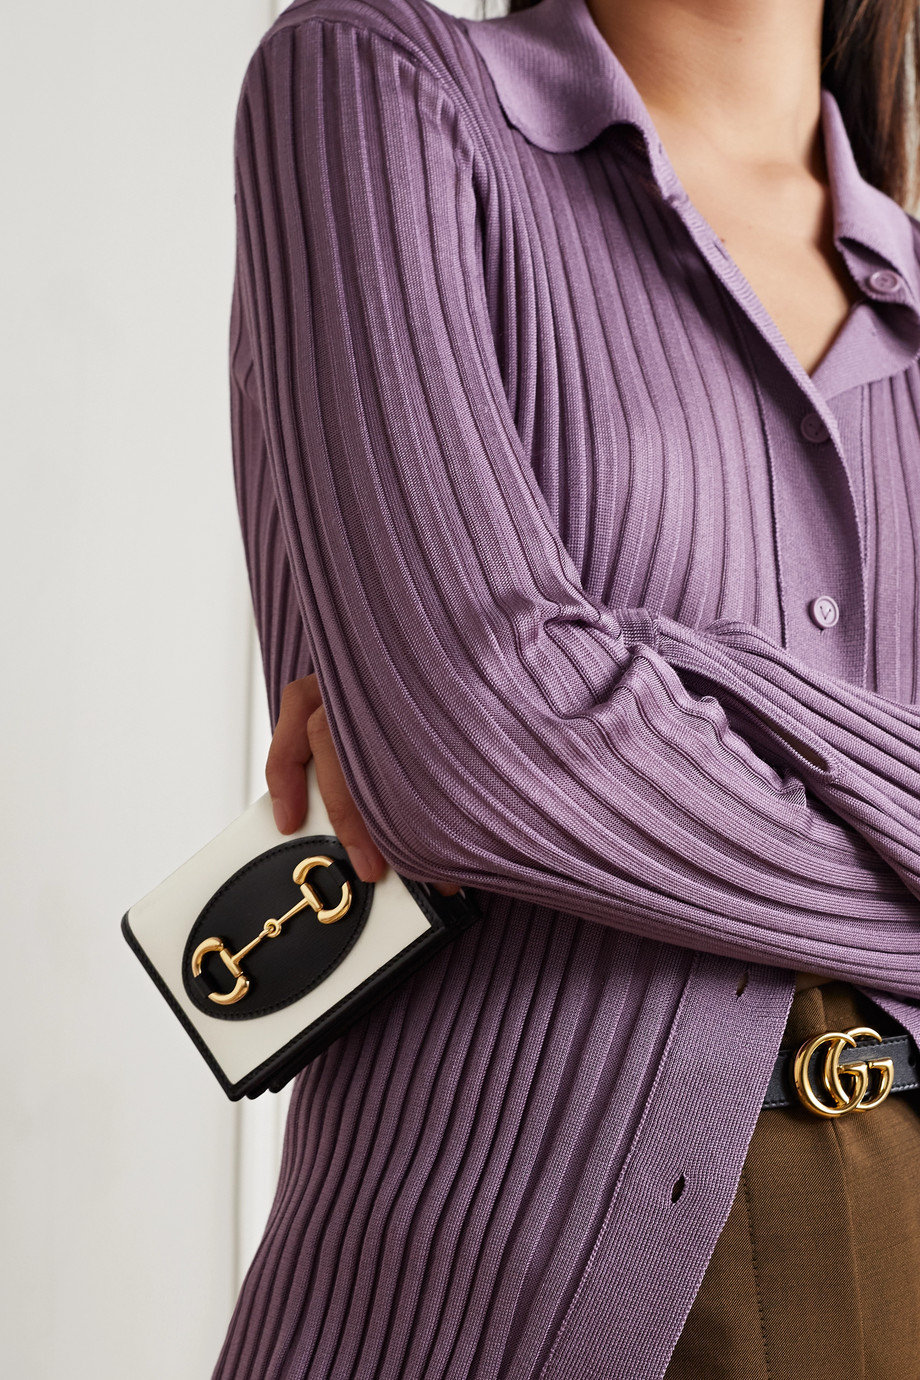 Gucci Portefeuille en cuir bicolore 1955 Horsebit